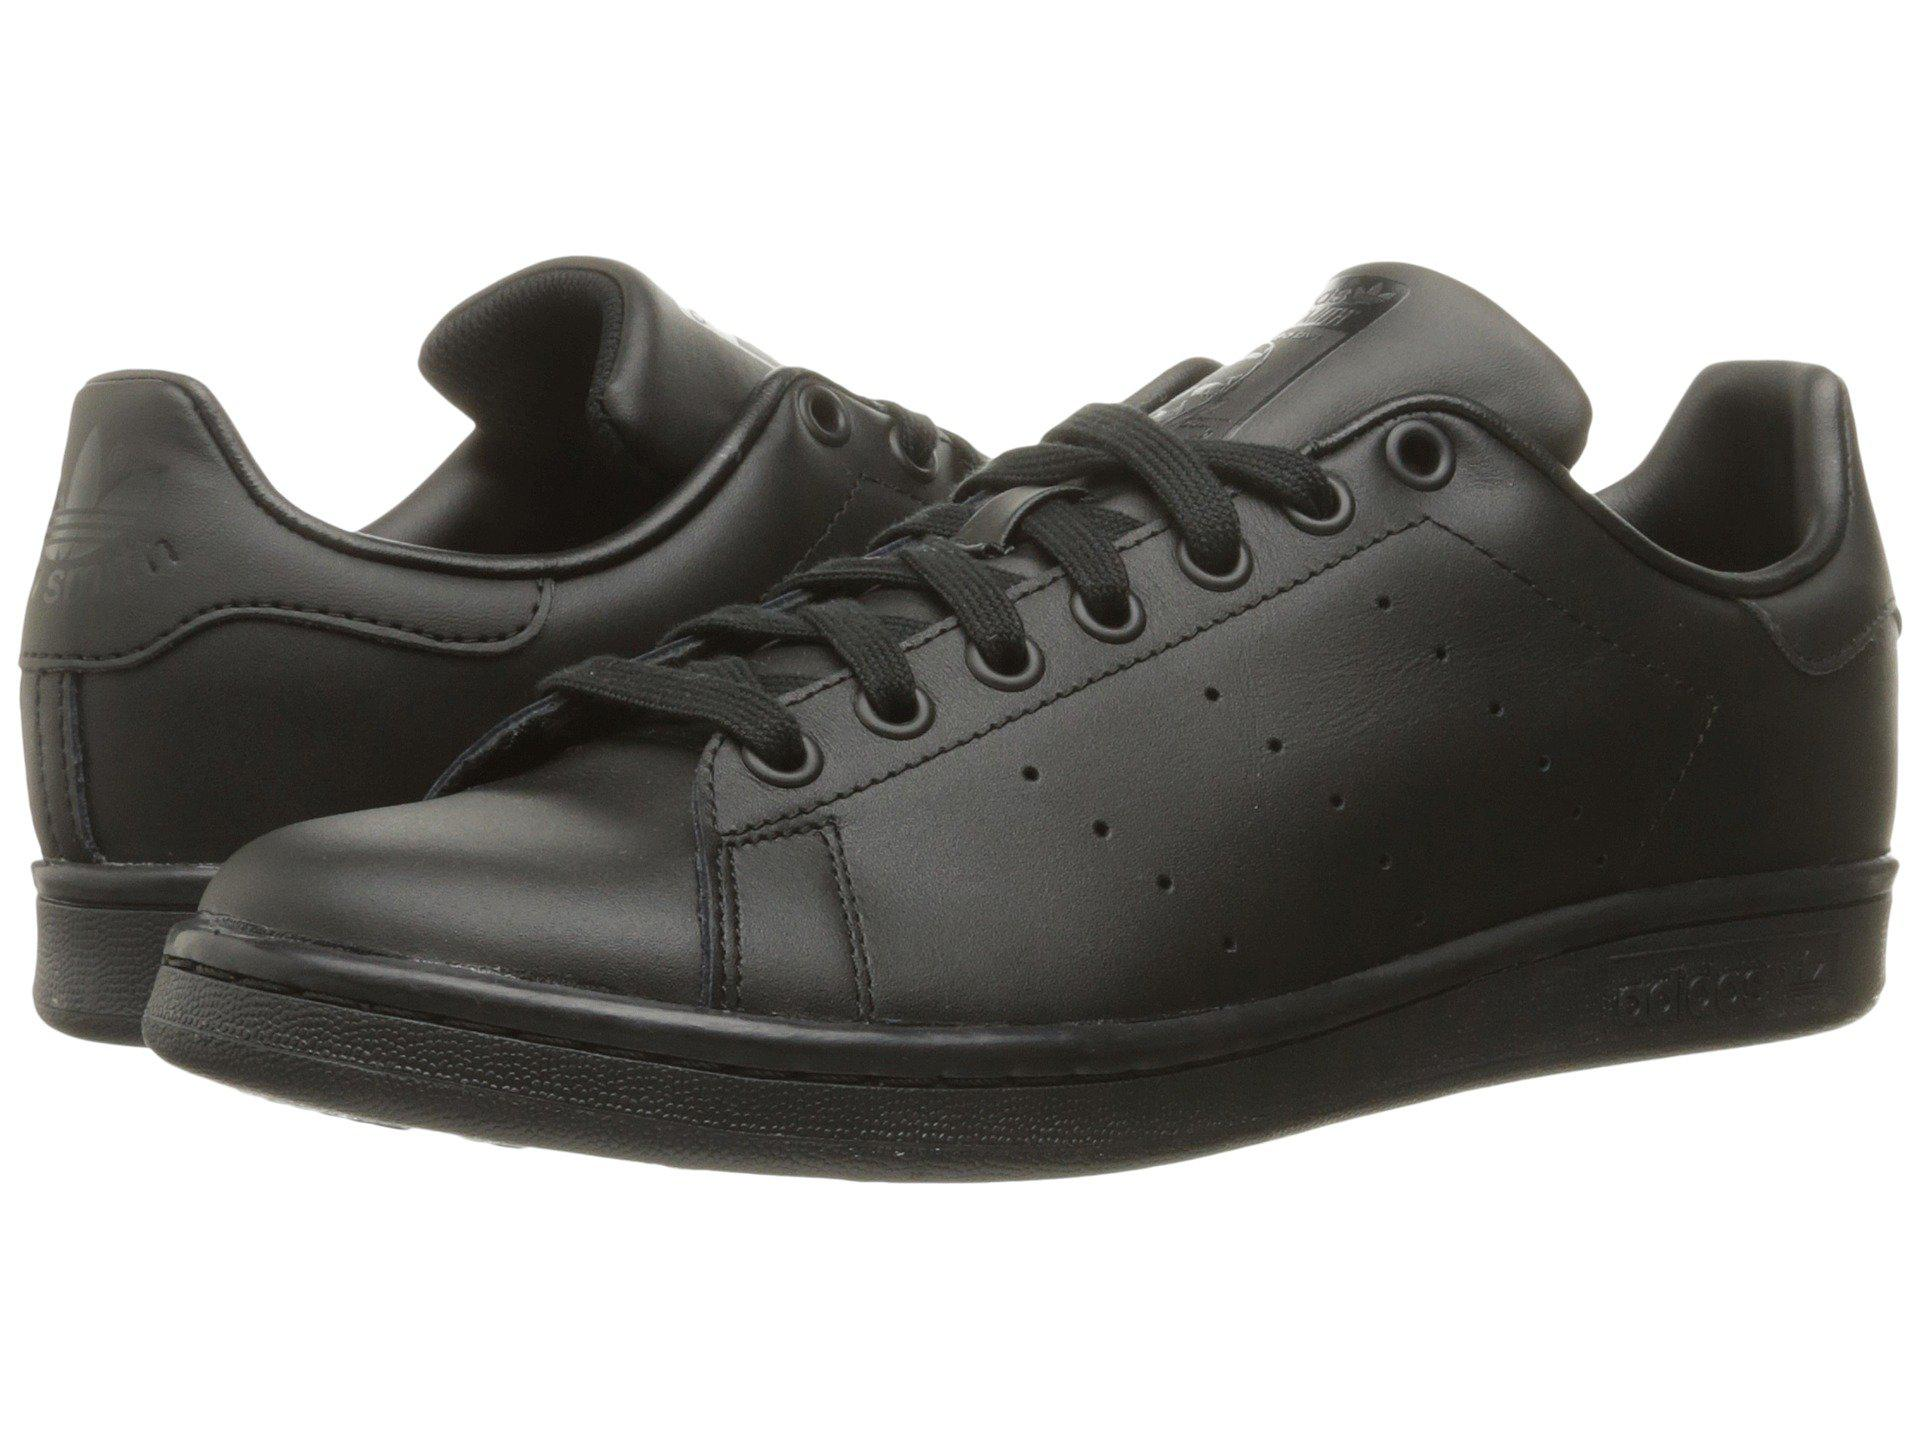 9224dca5f Lyst - adidas Originals Stan Smith (black 1 black 1 black 1) Men s ...